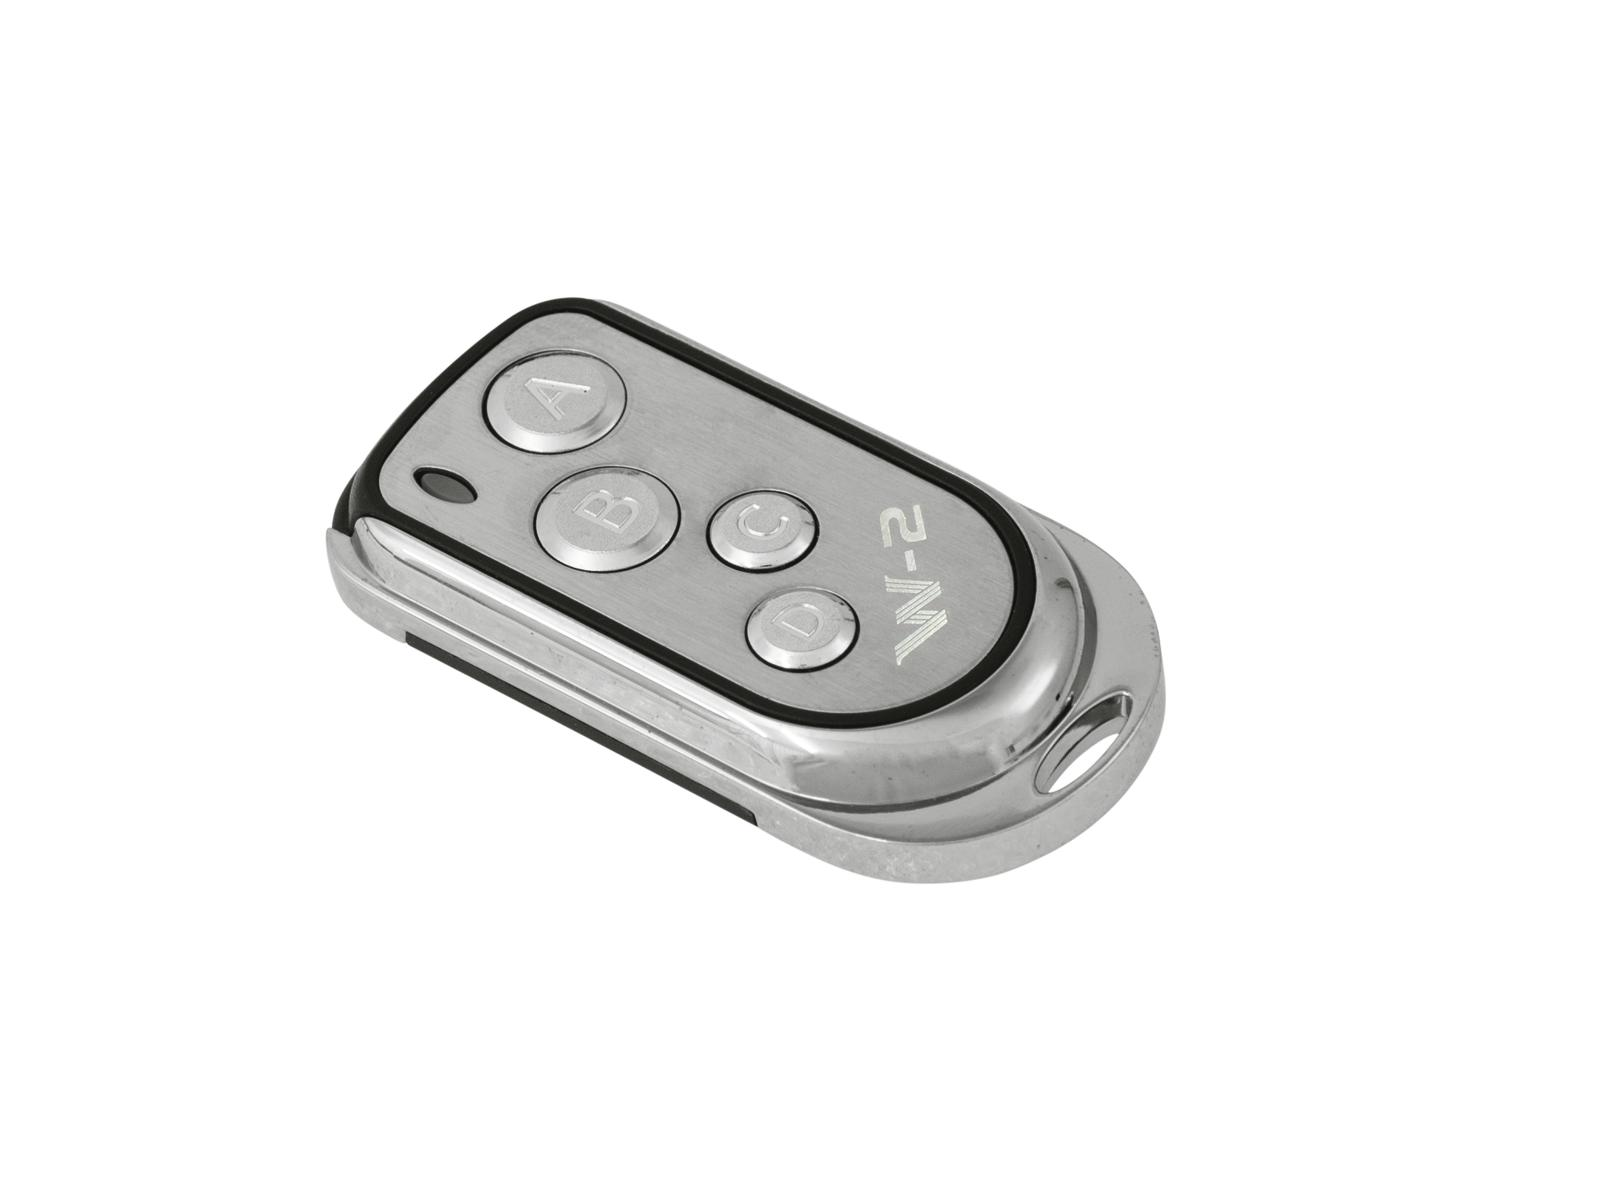 ANTARI W-2 controller Wireless